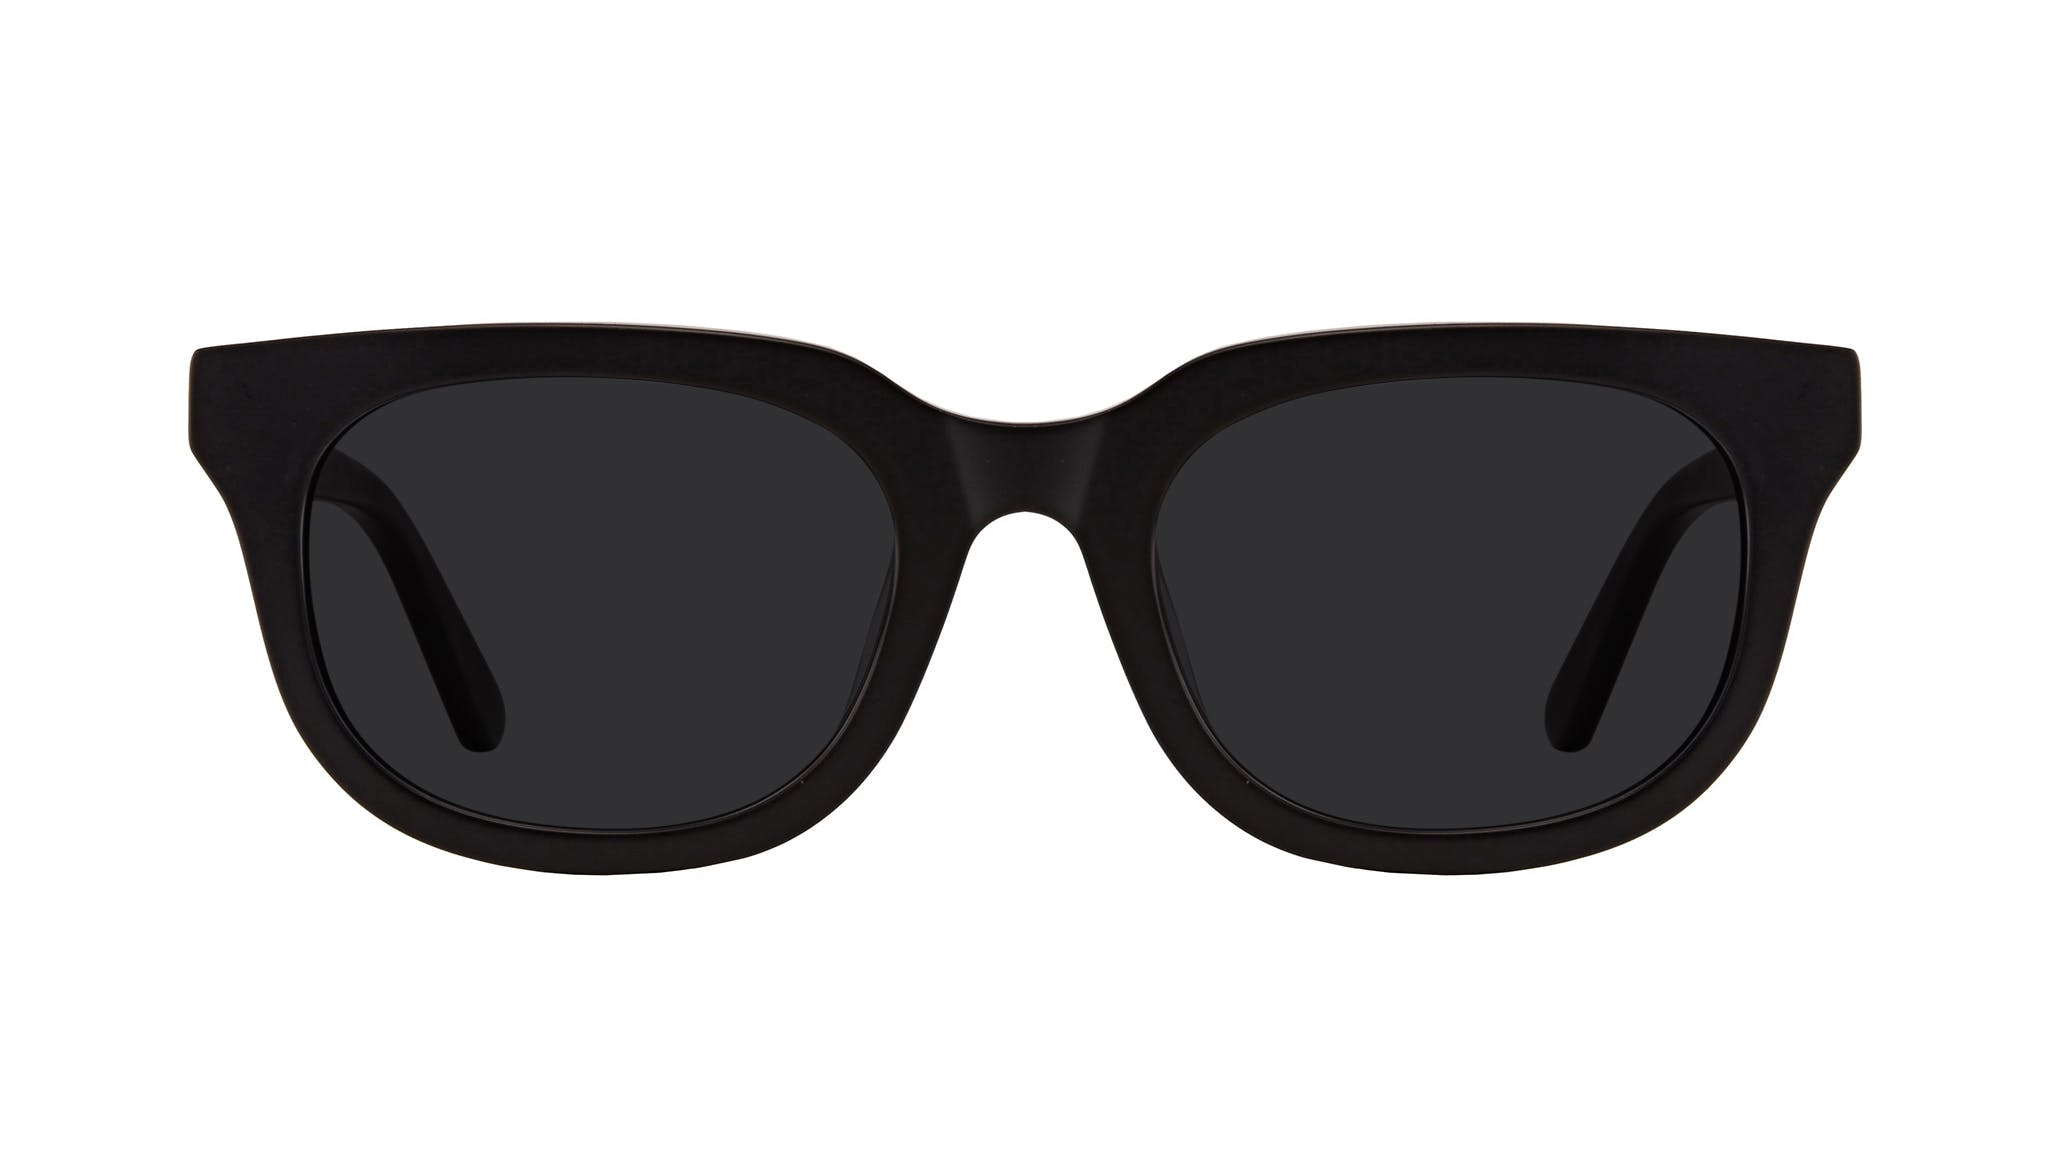 Affordable Fashion Glasses Square Sunglasses Men Stout Matte Black Front